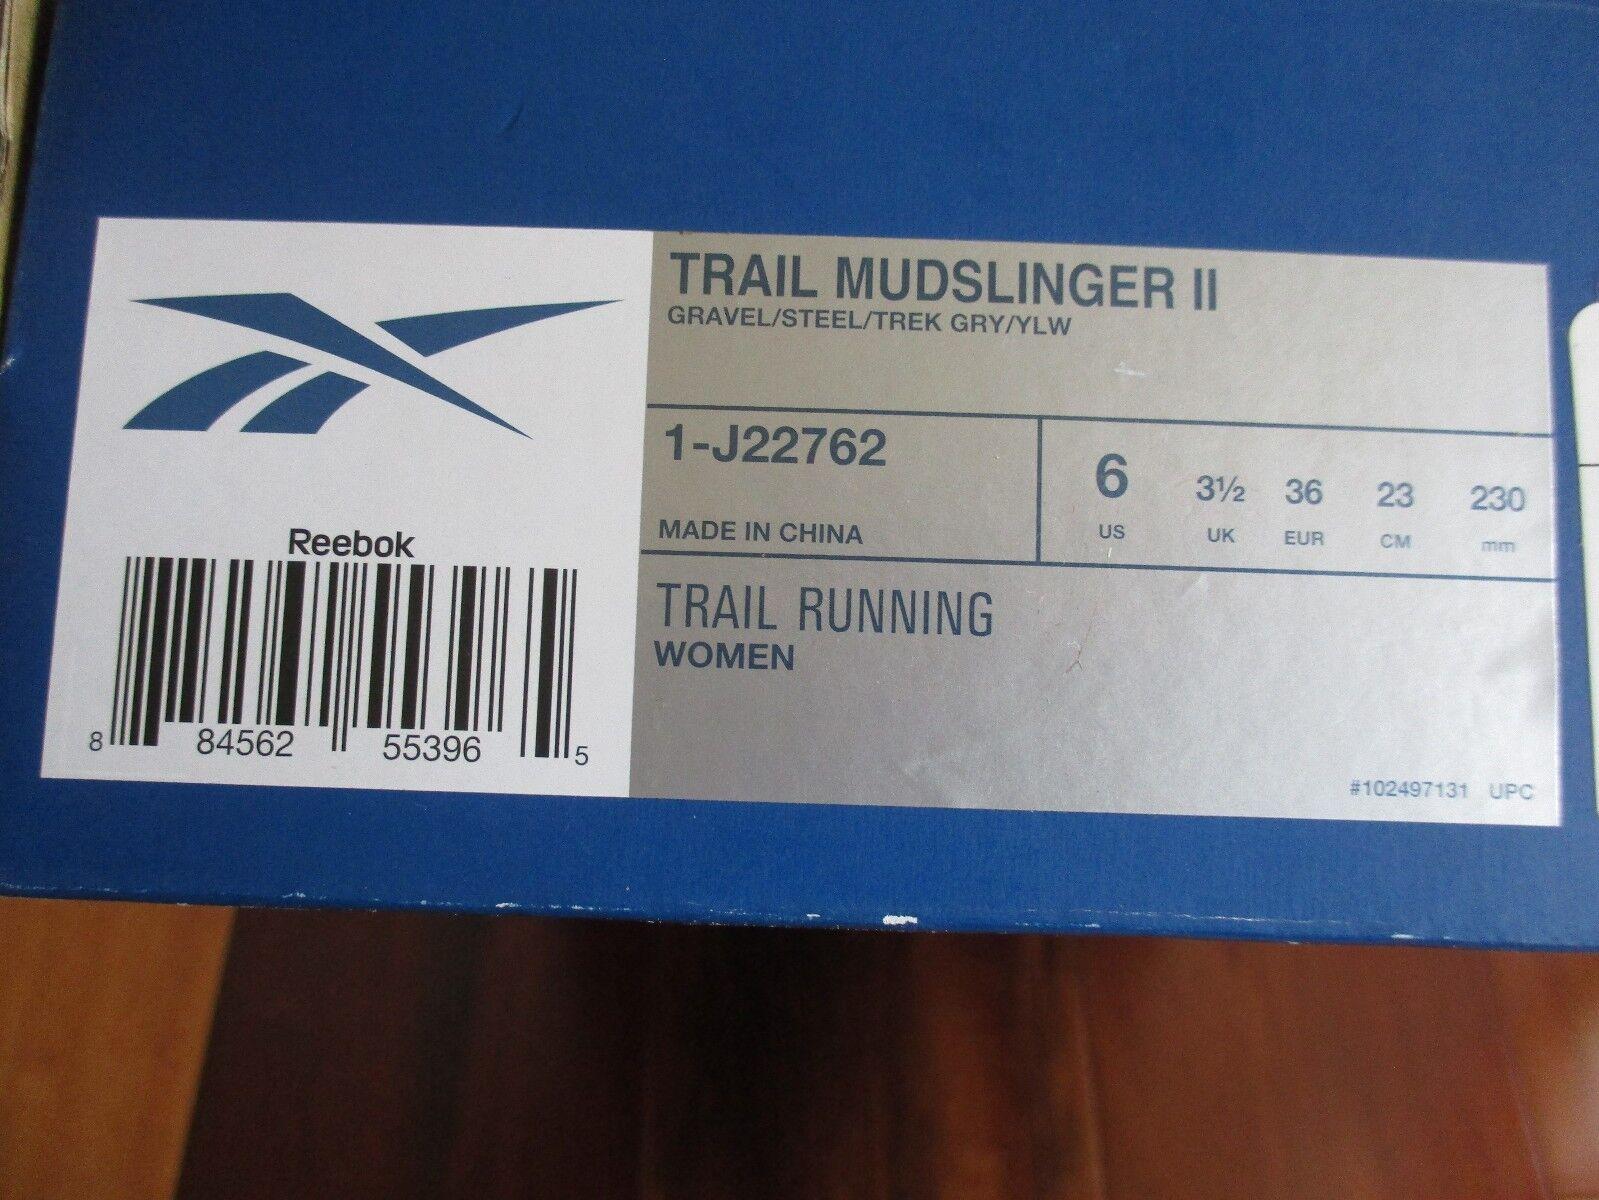 BNIB Reebok running Trail Mudslinger II Damenschuhe trail running Reebok schuhe, Größe 6 527bfc